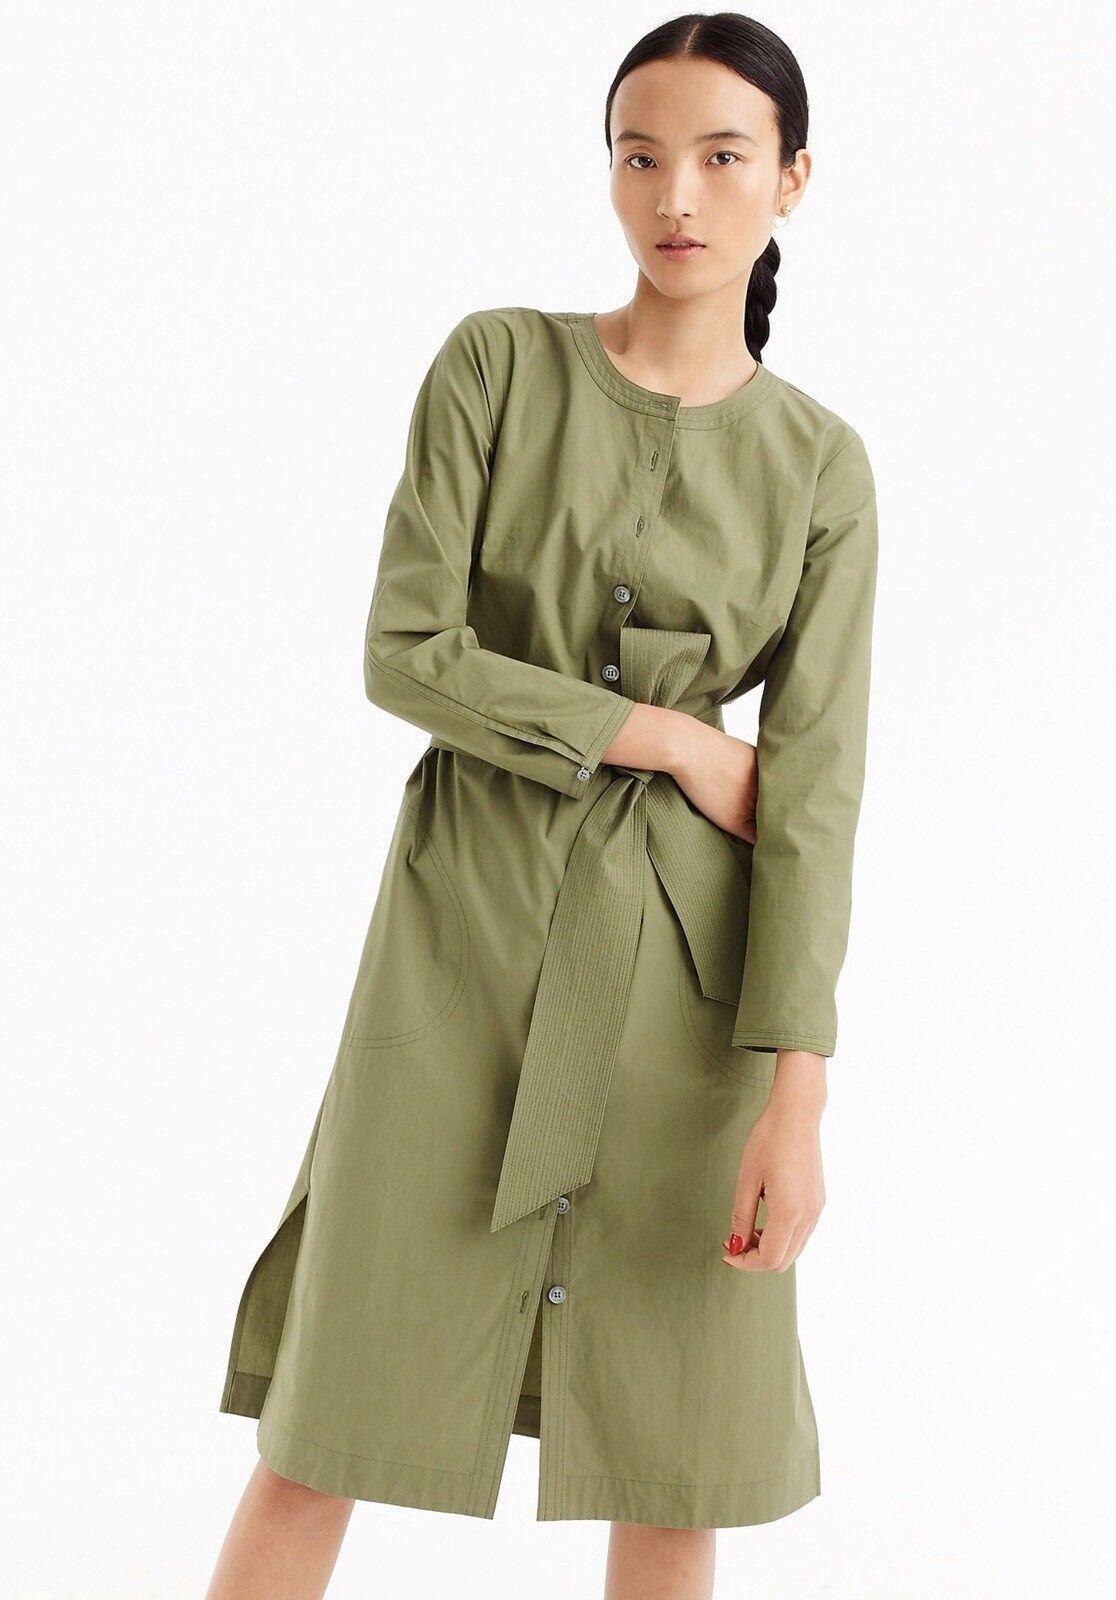 NWT JCrew Size S Women Long-Sleeve Shirtdress Green Green Green Olive Faded Glory ( 98) 080557